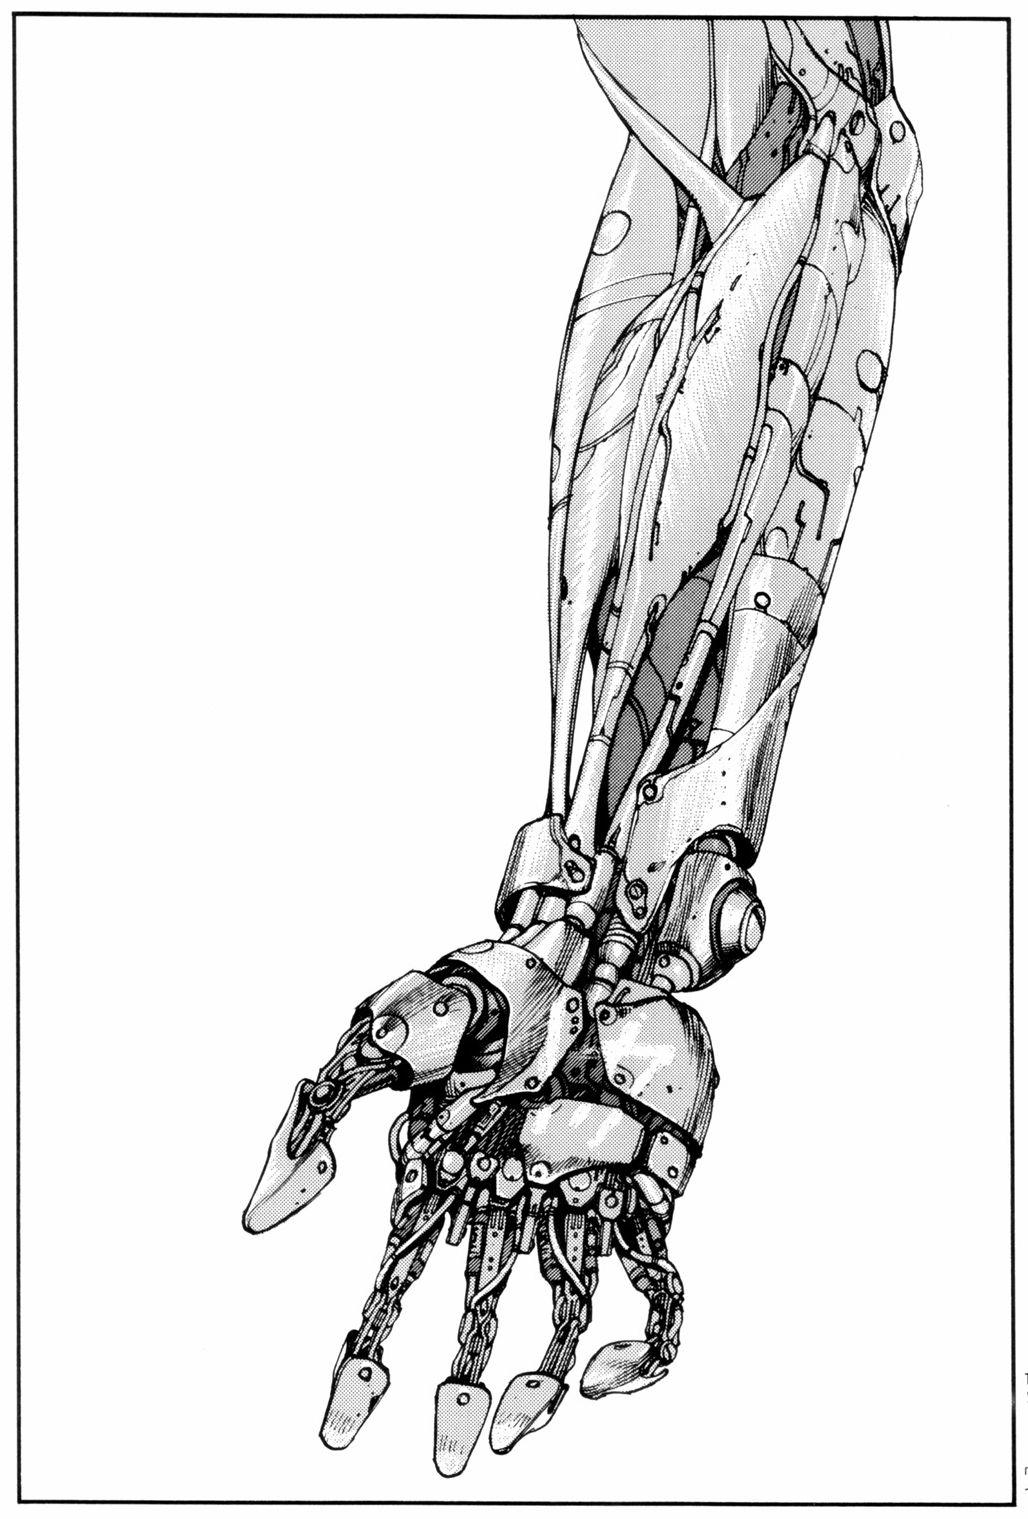 Akira scan cyberpunk art robot concept art katsuhiro otomo